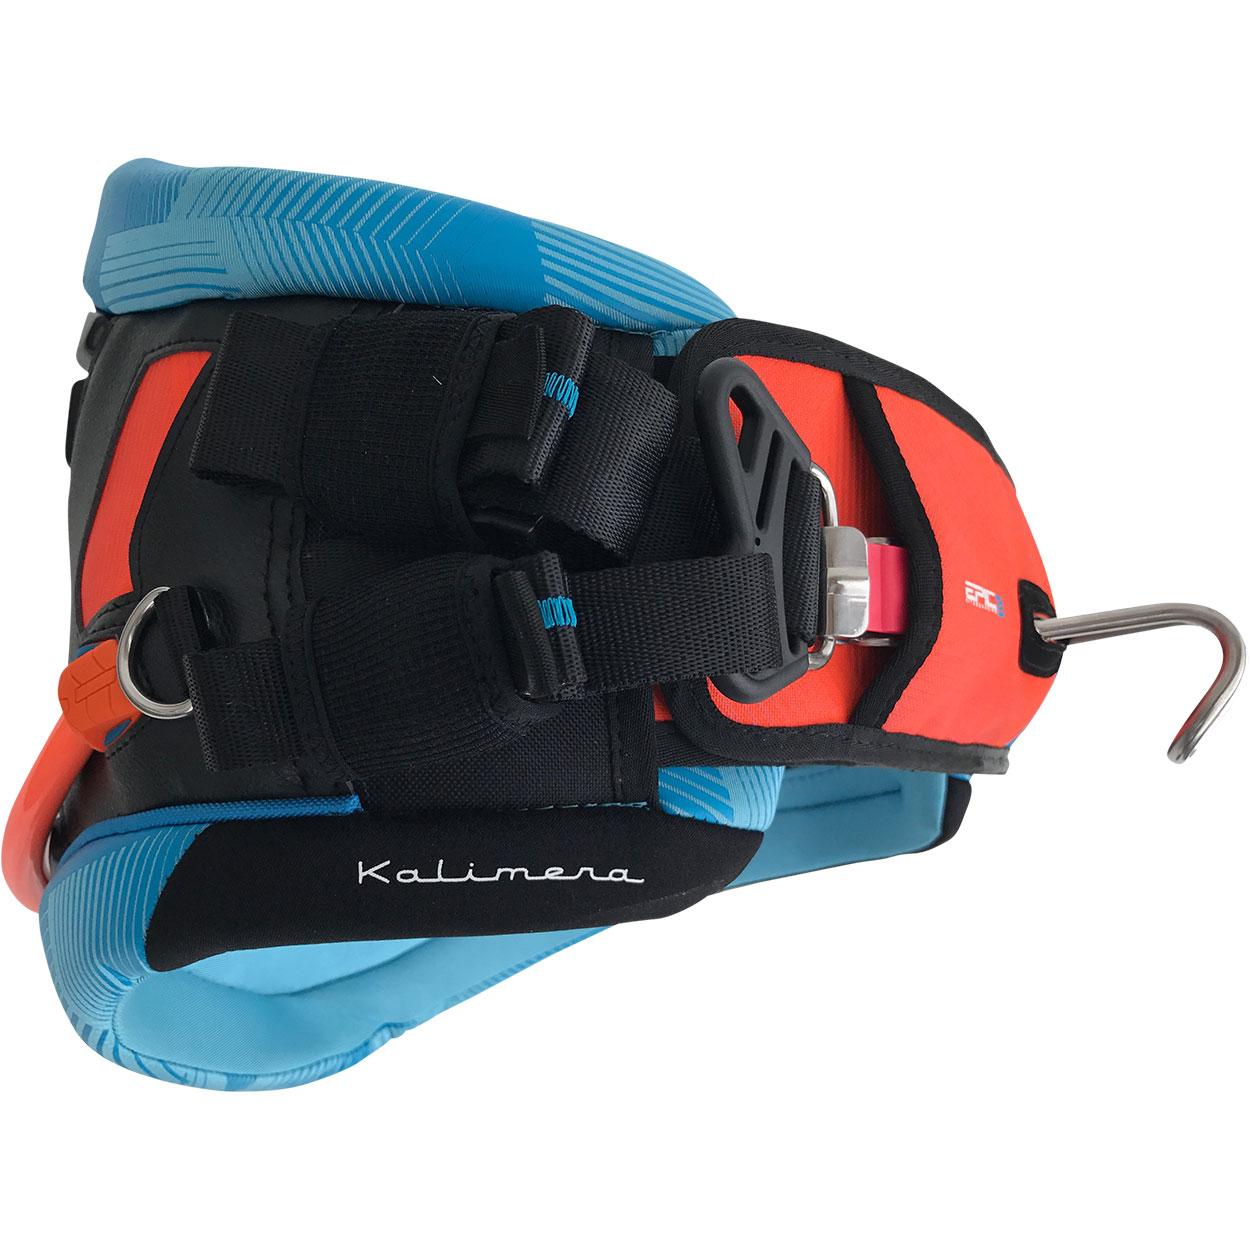 EPIC KITES KITEBOARDING   Harnesses   Kalimera Harness